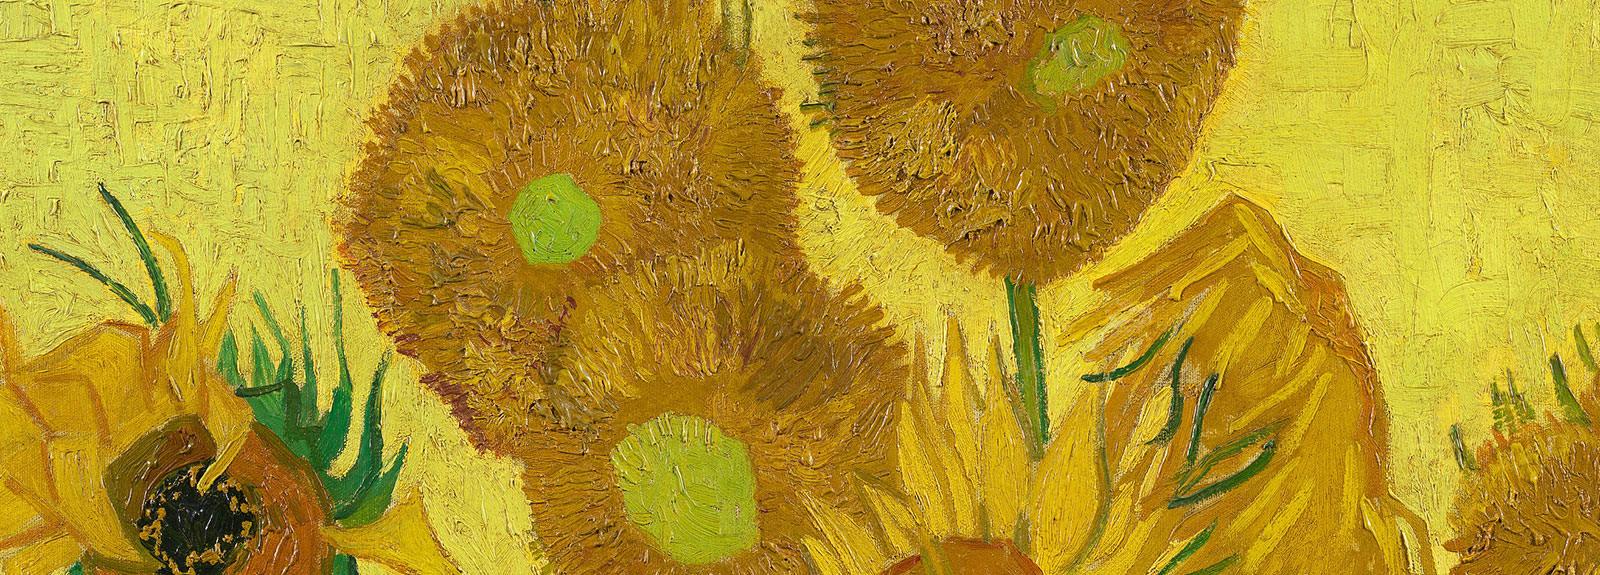 Vincent van Gogh, van Gogh słoneczniki, słoneczniki, malarstwo holenderskie, Niezła sztuka